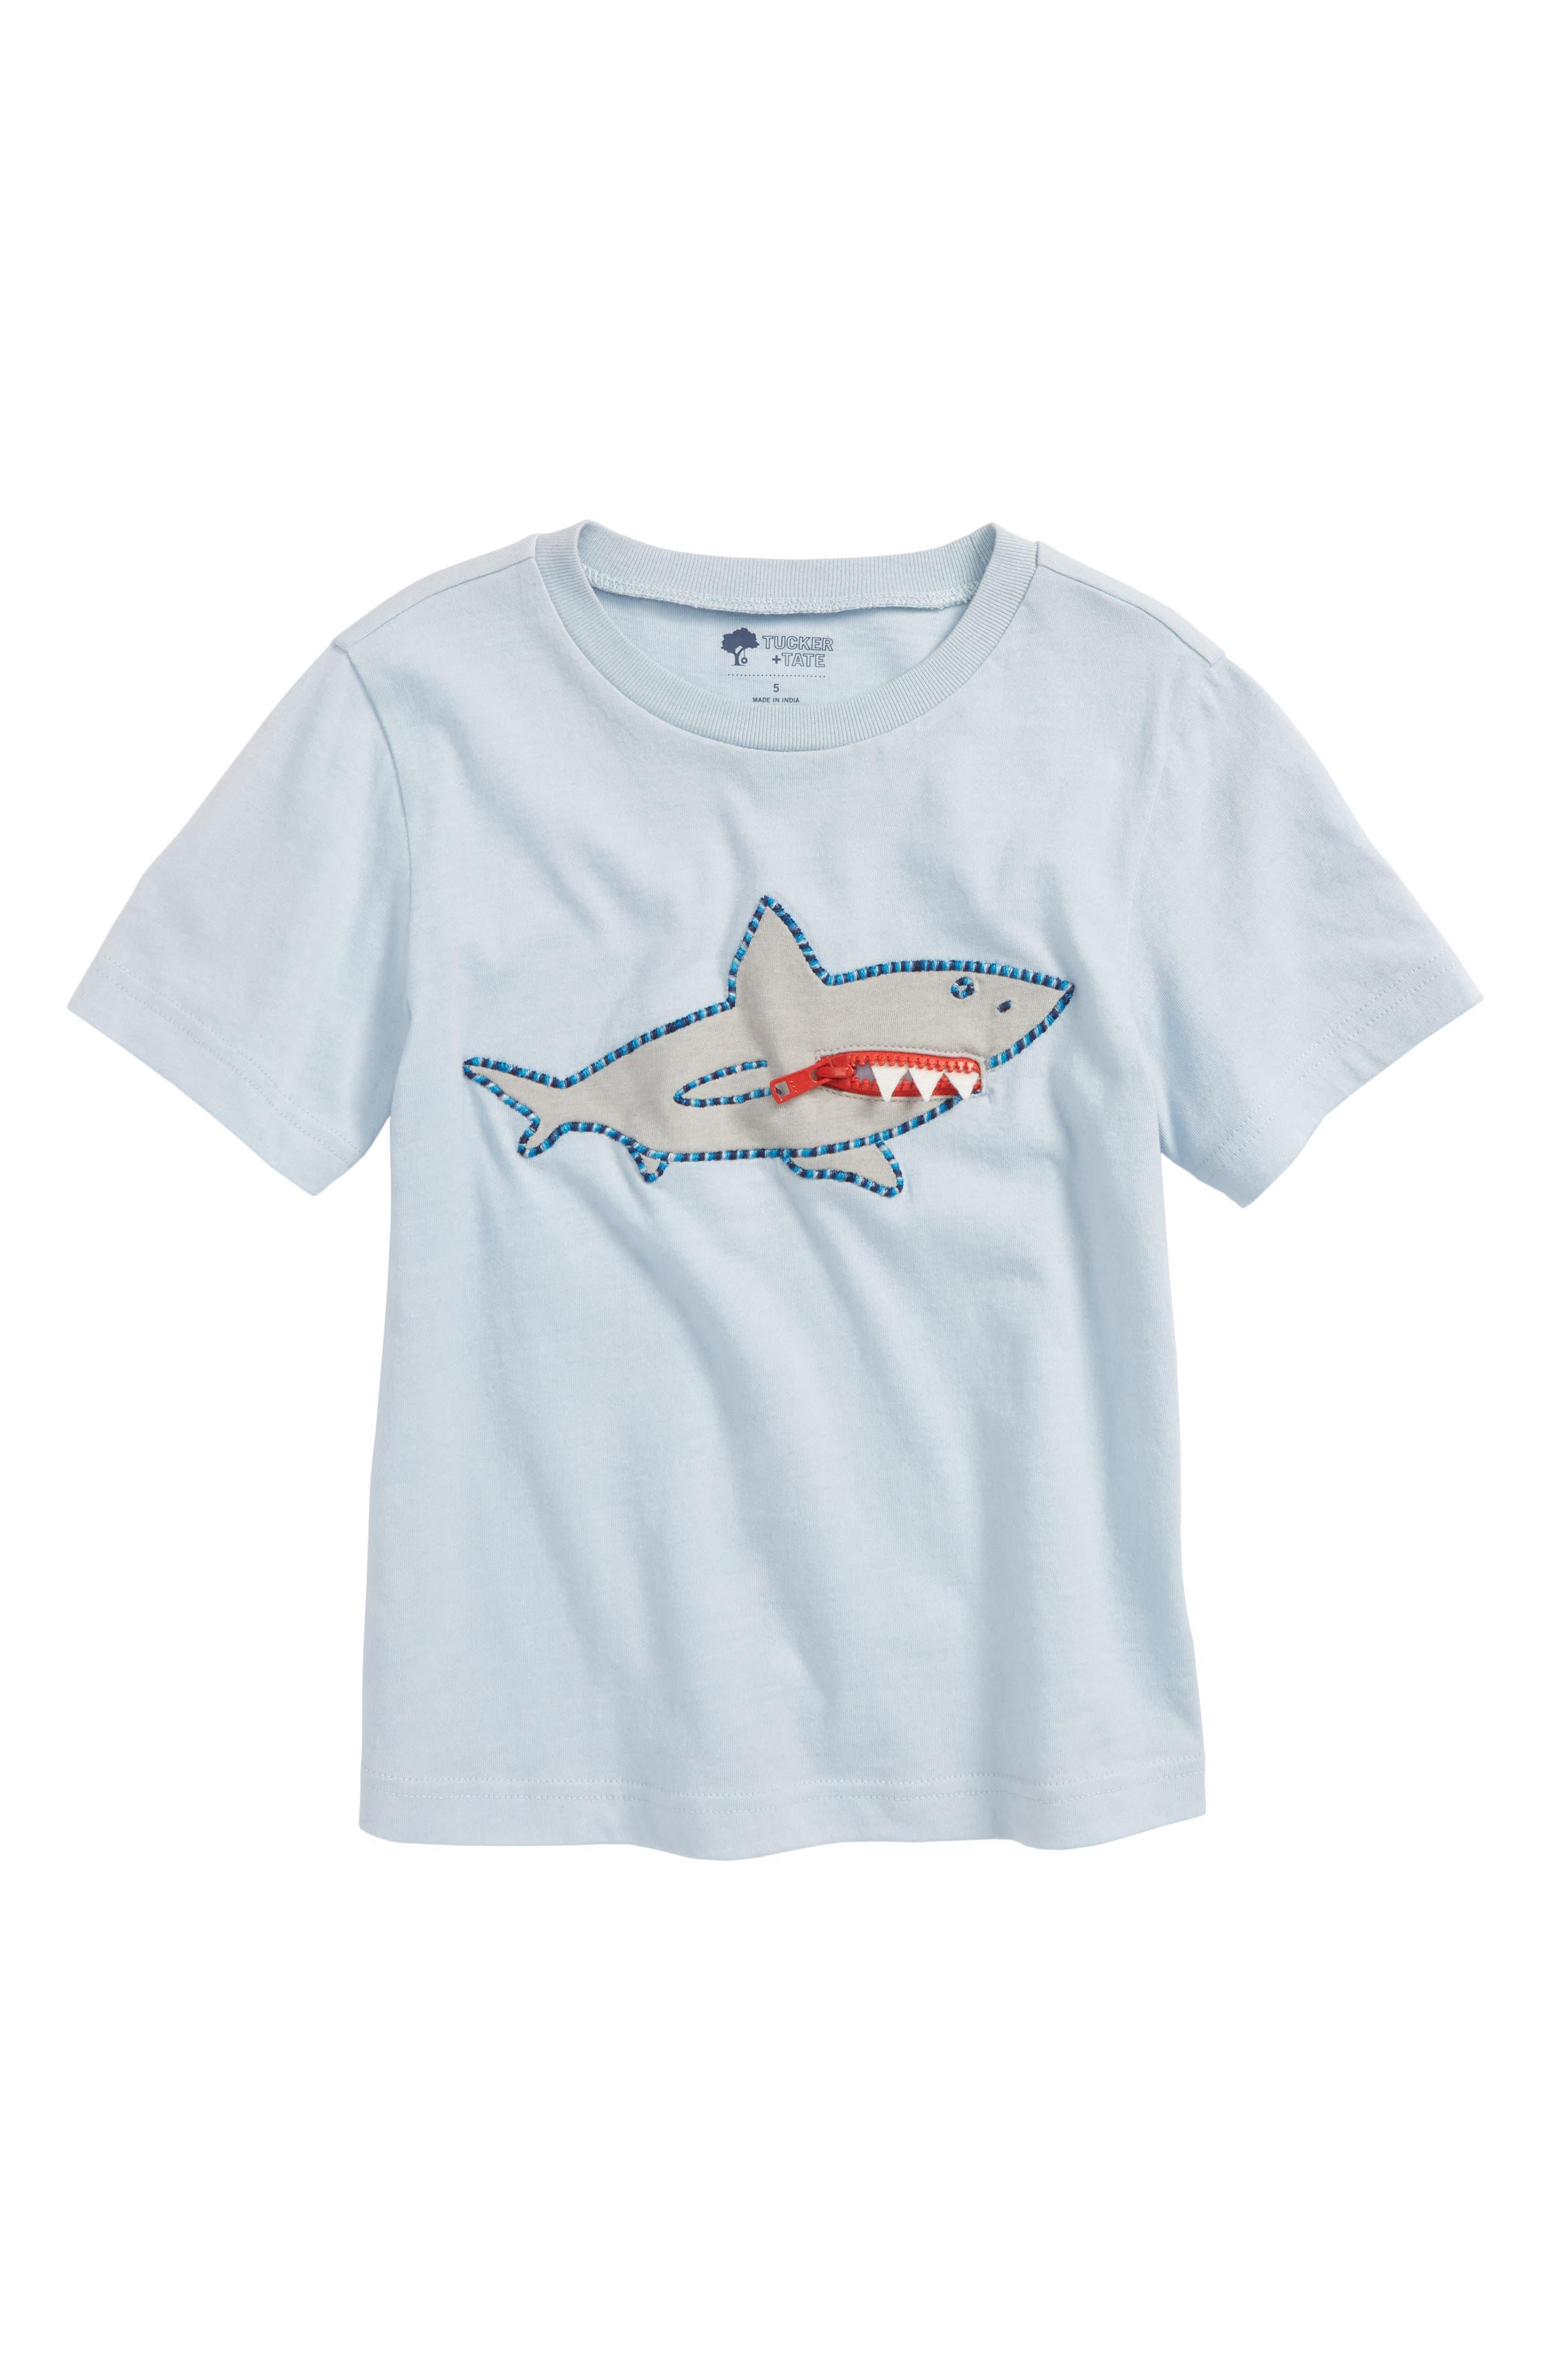 Tucker + Tate 3D Graphic T-Shirt (Toddler Boys & Little Boys)